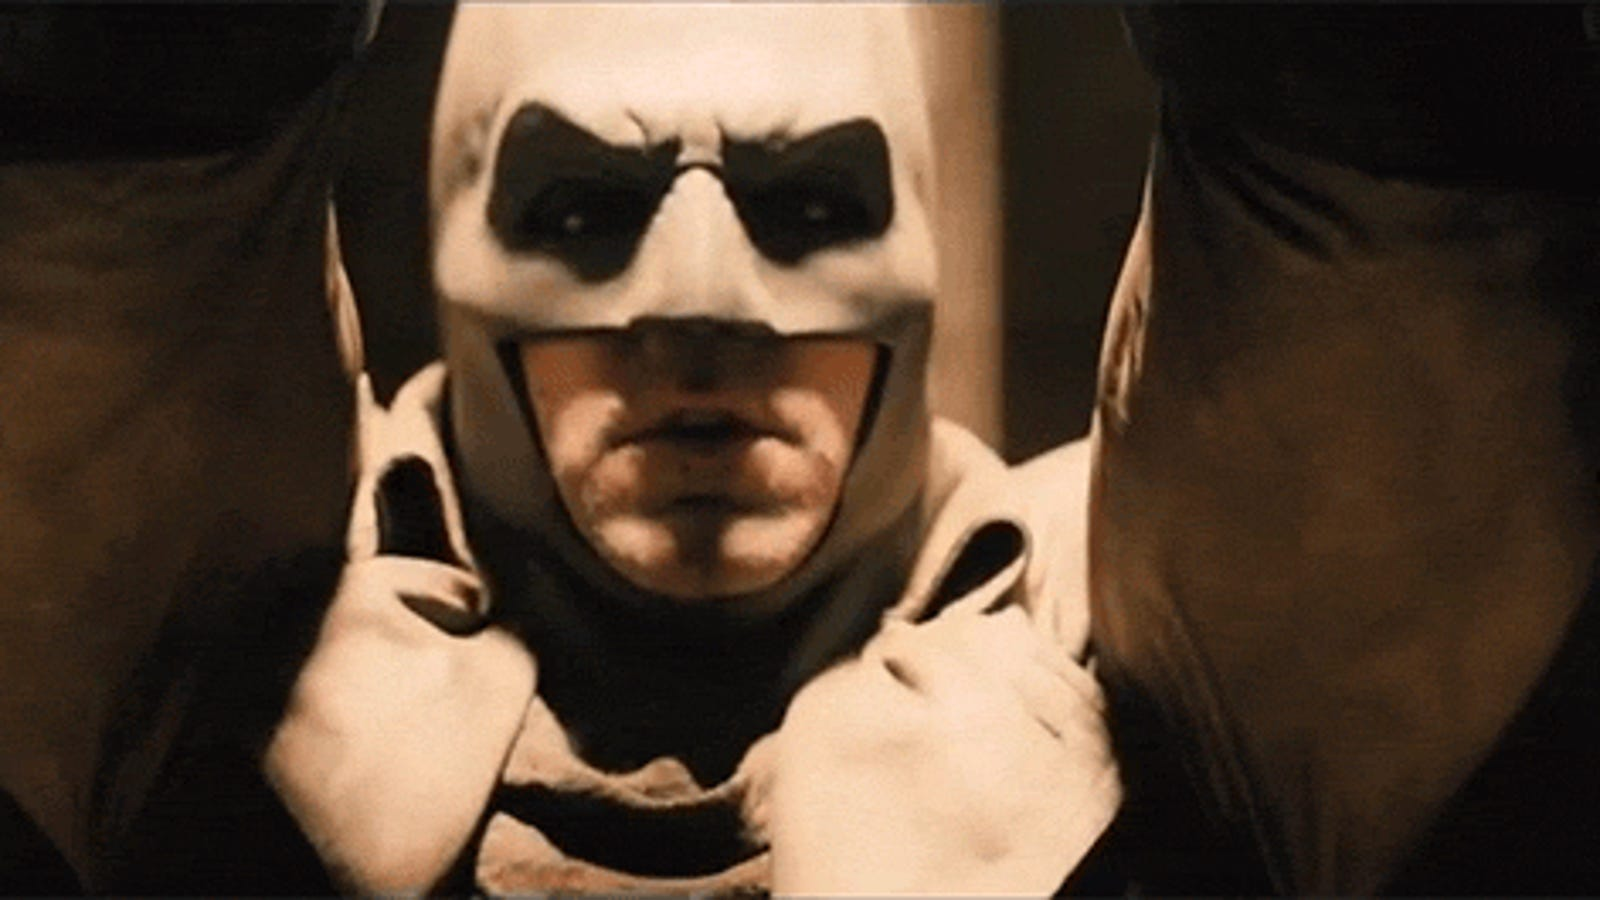 Why superhero movies suck - Super batman movie ...